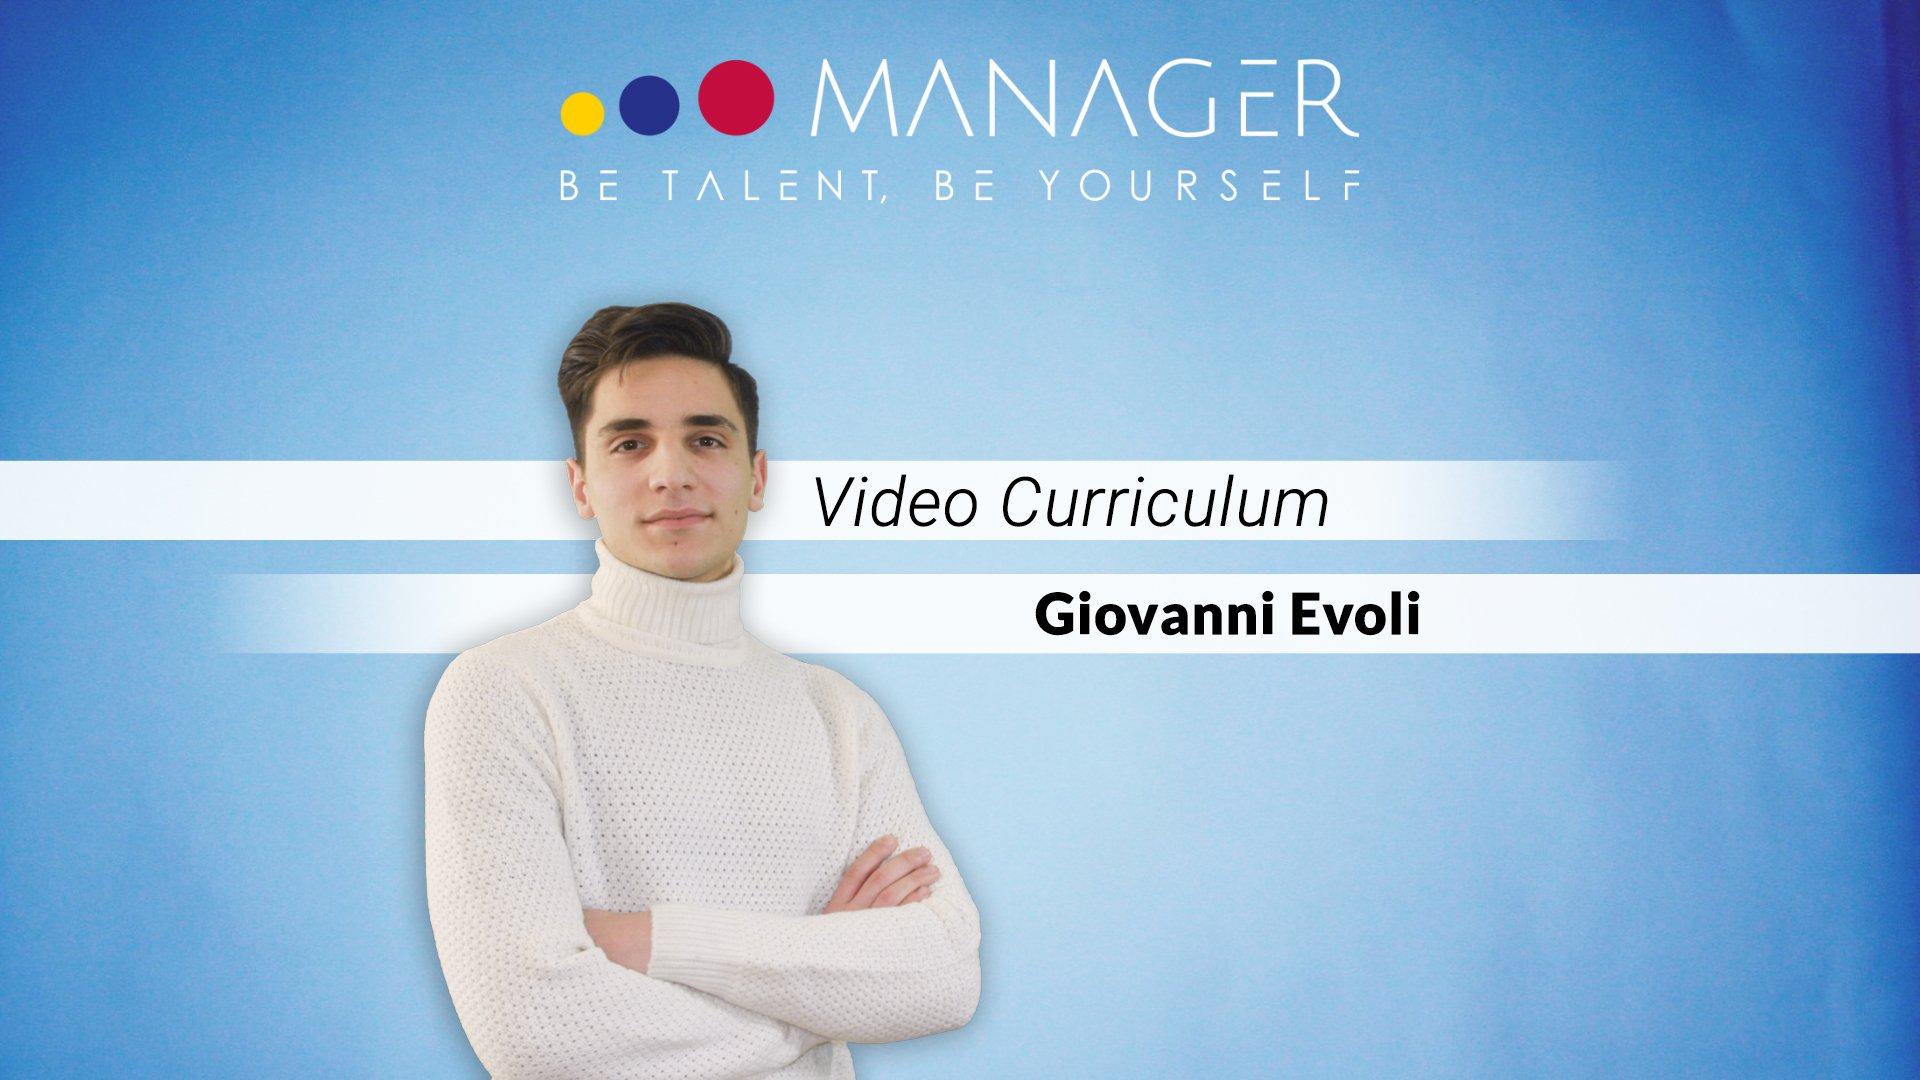 Giovanni Evoli